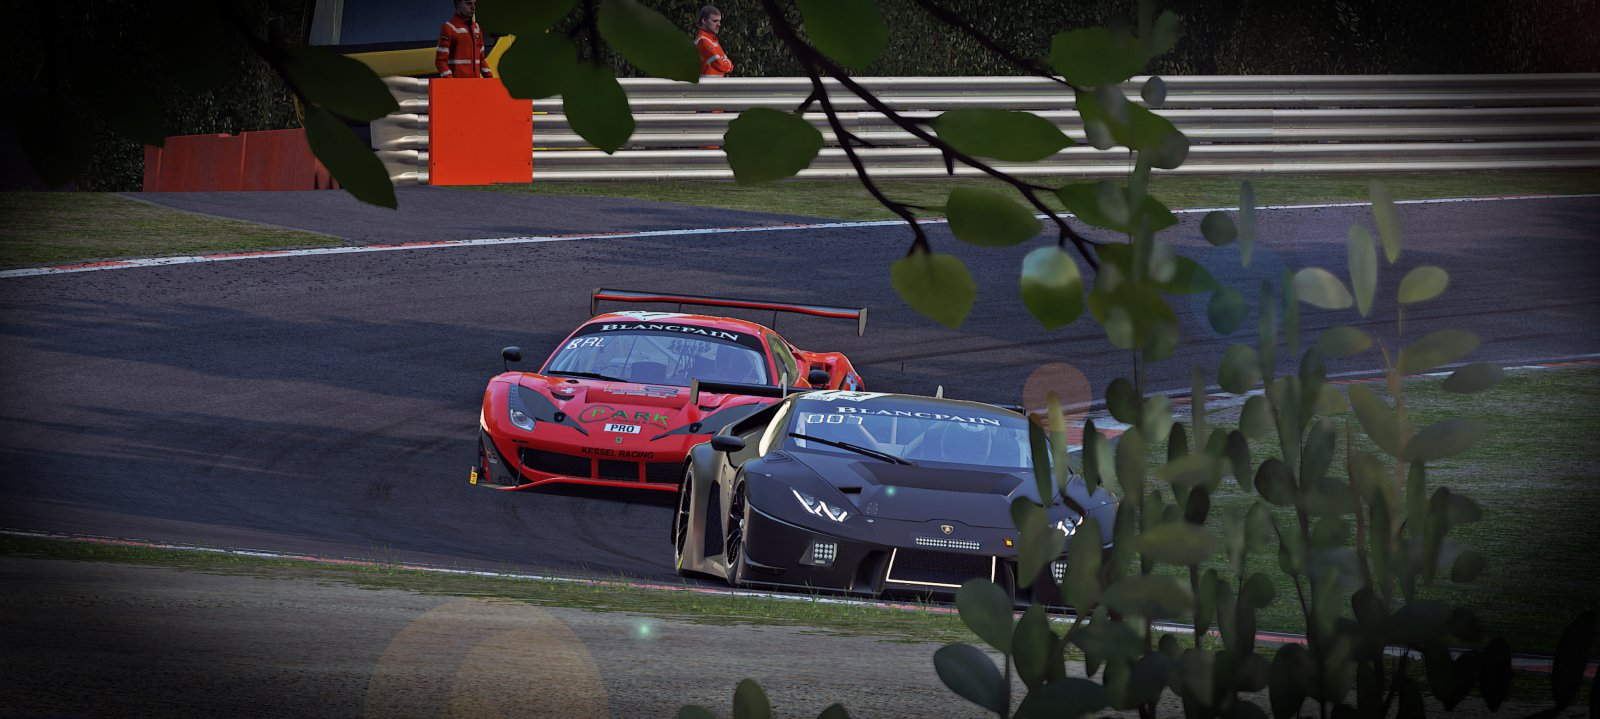 Assetto Corsa Competizione Screenshot 2019.12.03 - 13.17.44.39.jpg